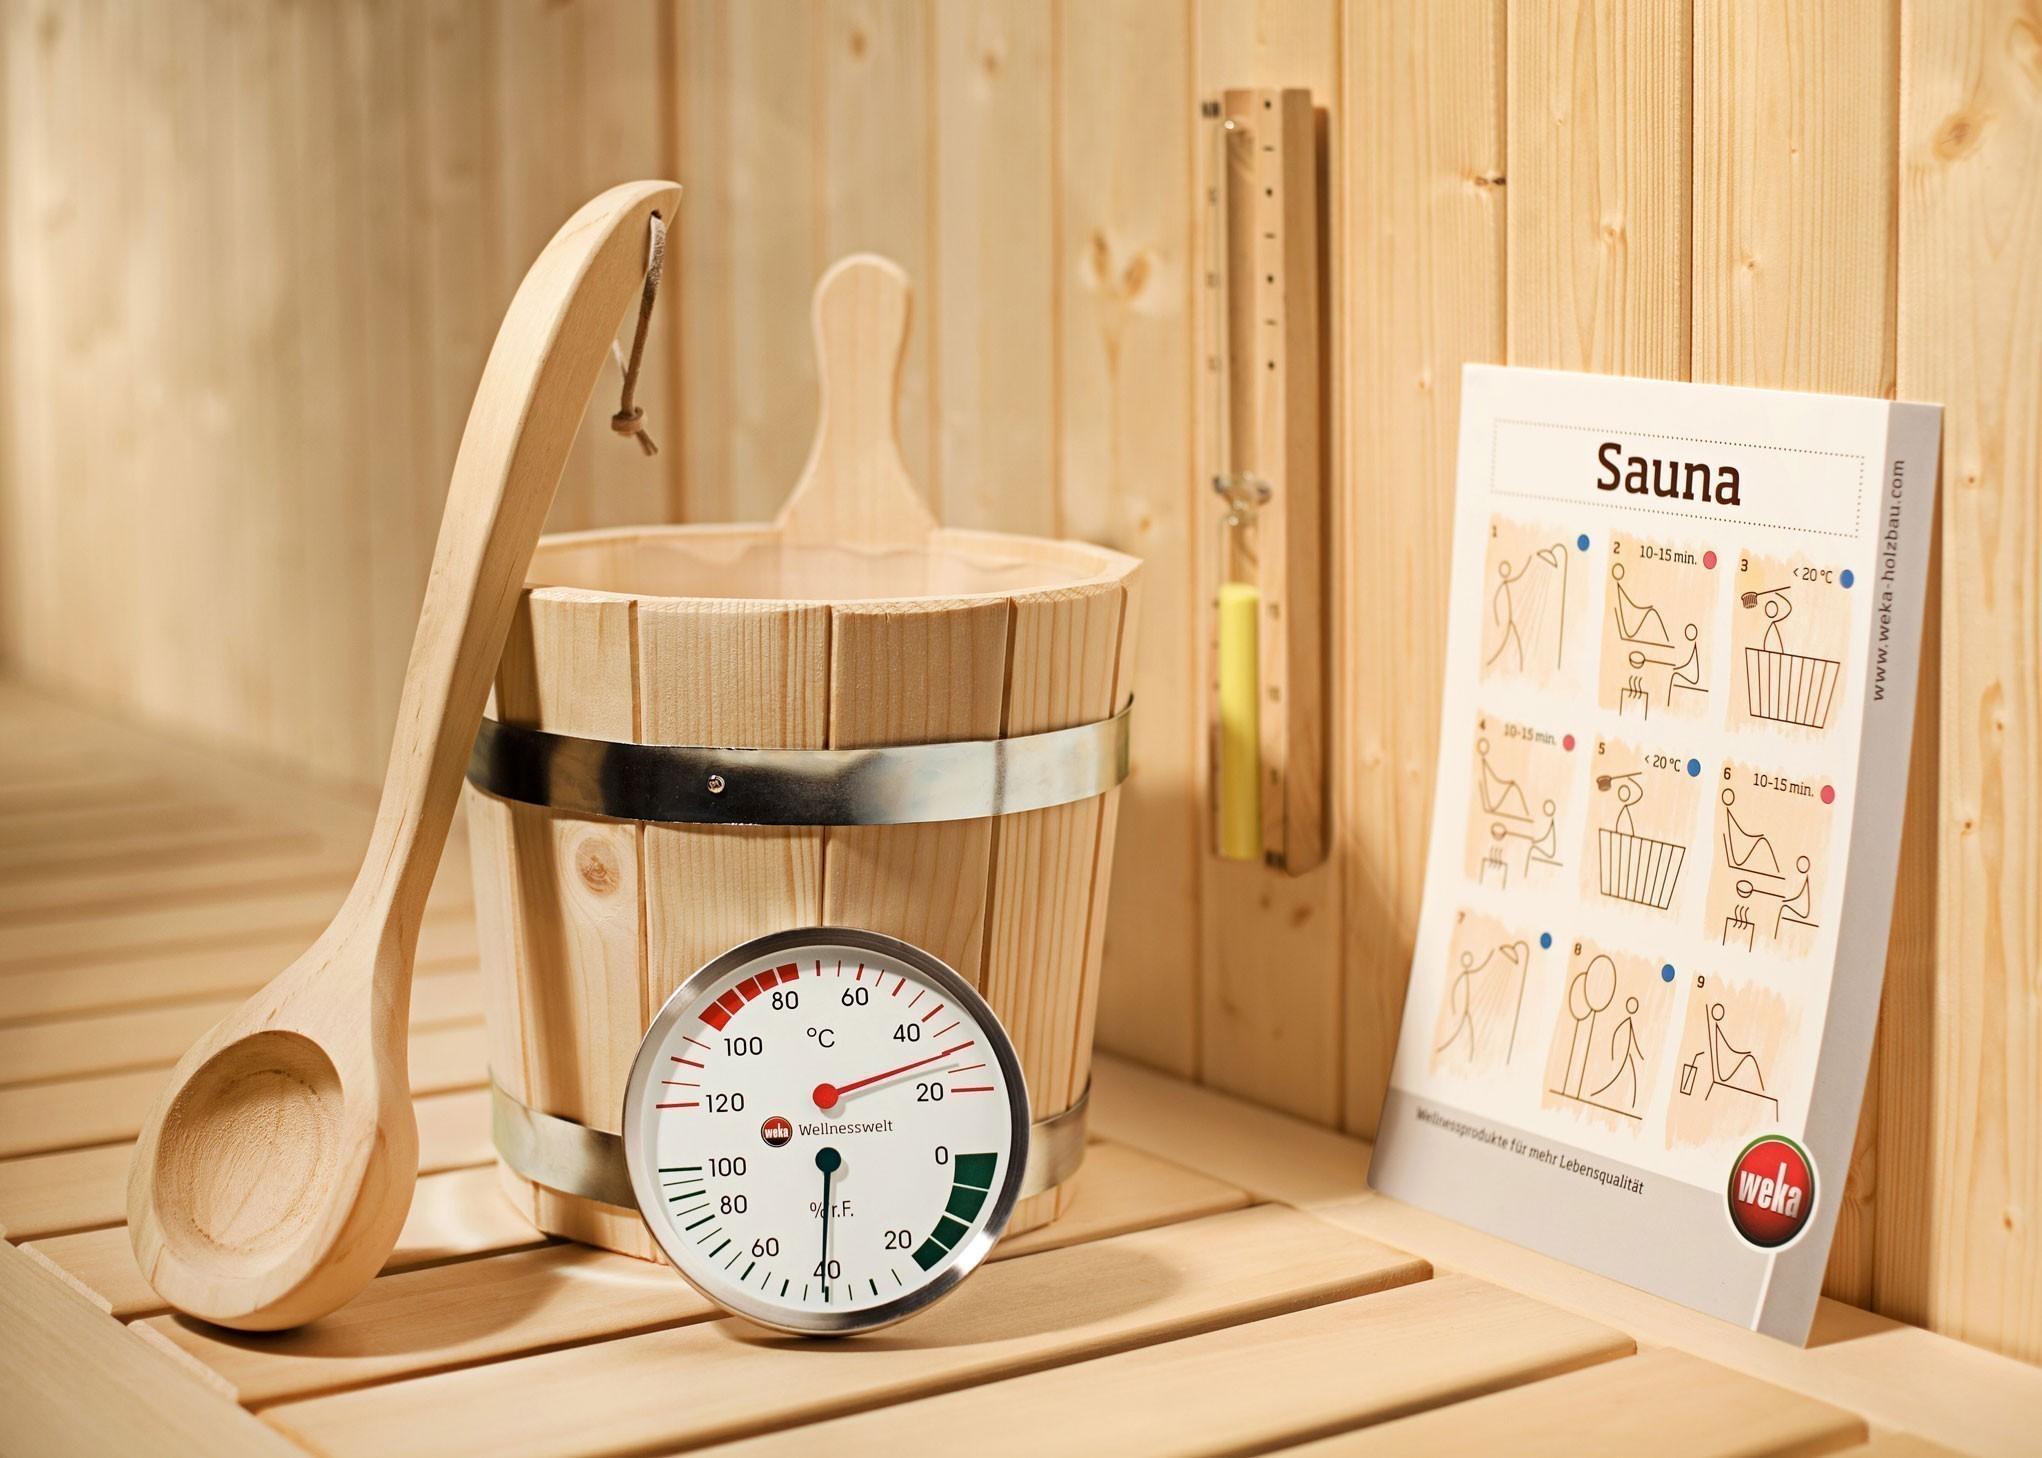 sauna zubeh r set weka 5 teilig bei. Black Bedroom Furniture Sets. Home Design Ideas